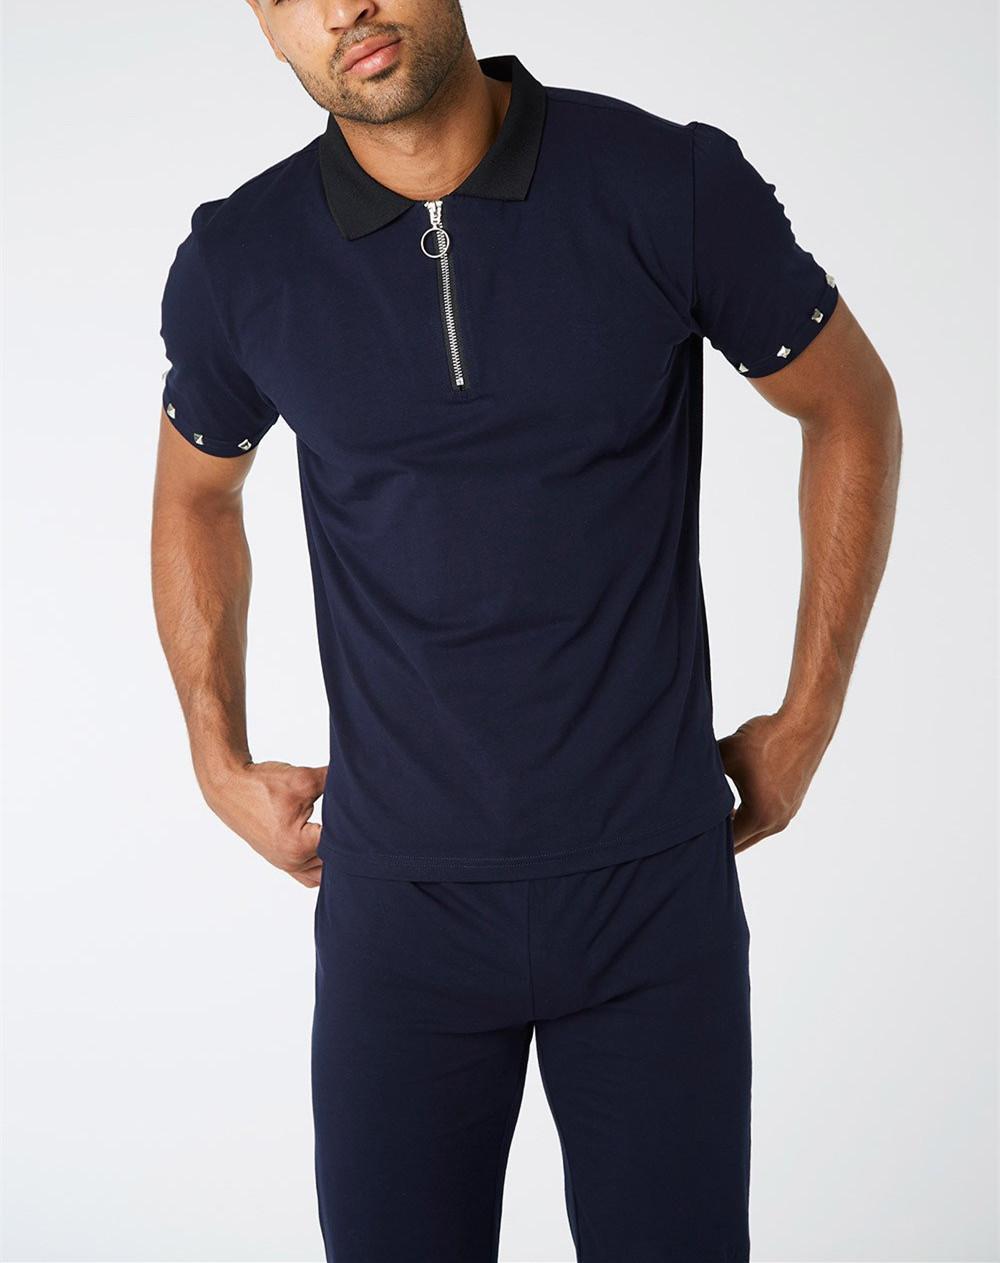 f735a701 Polo T Shirt Custom Design